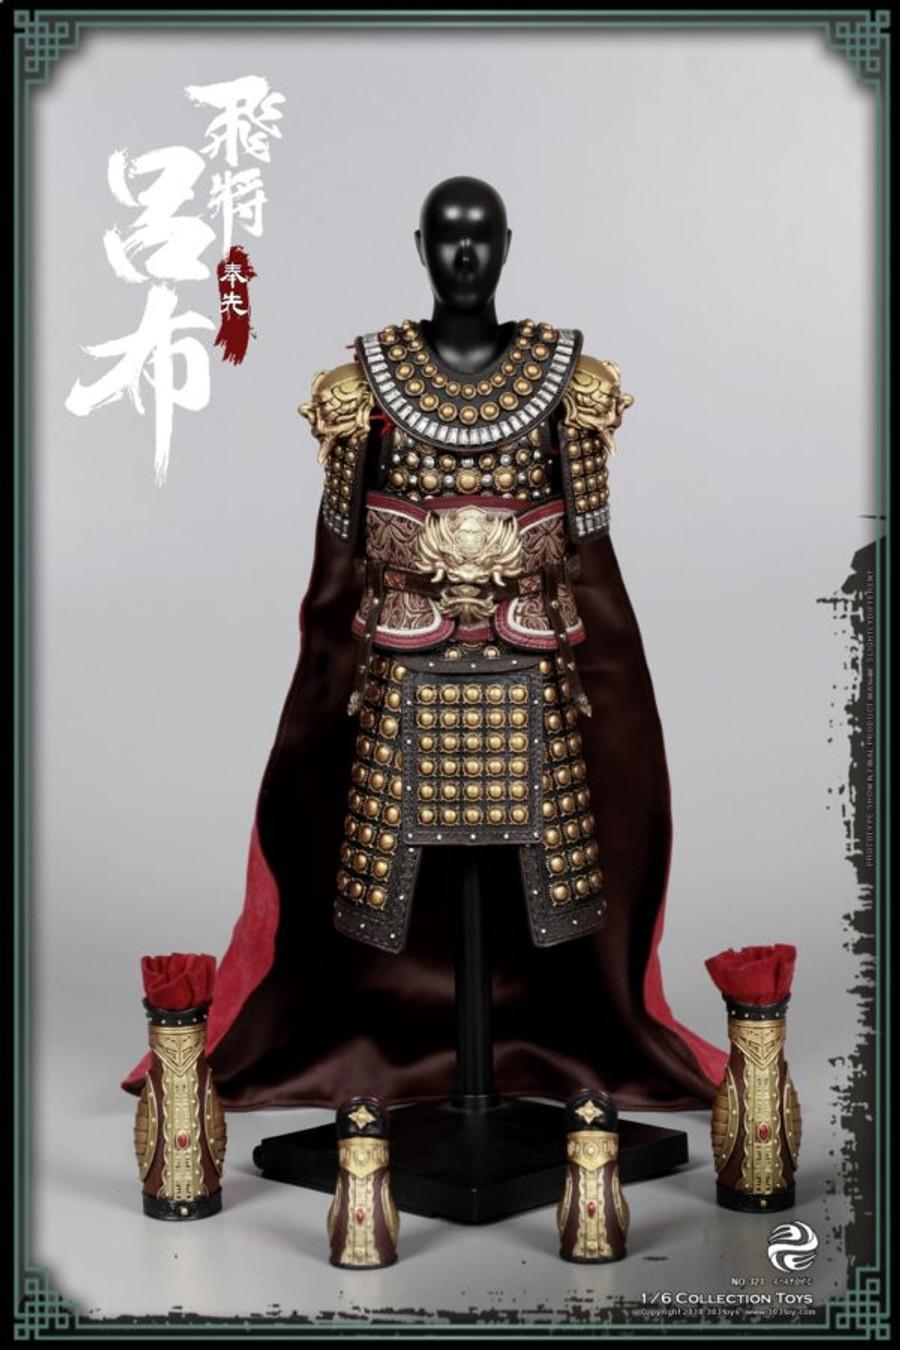 303 Toys - Soaring General LV BU A.K.A. Fengxian